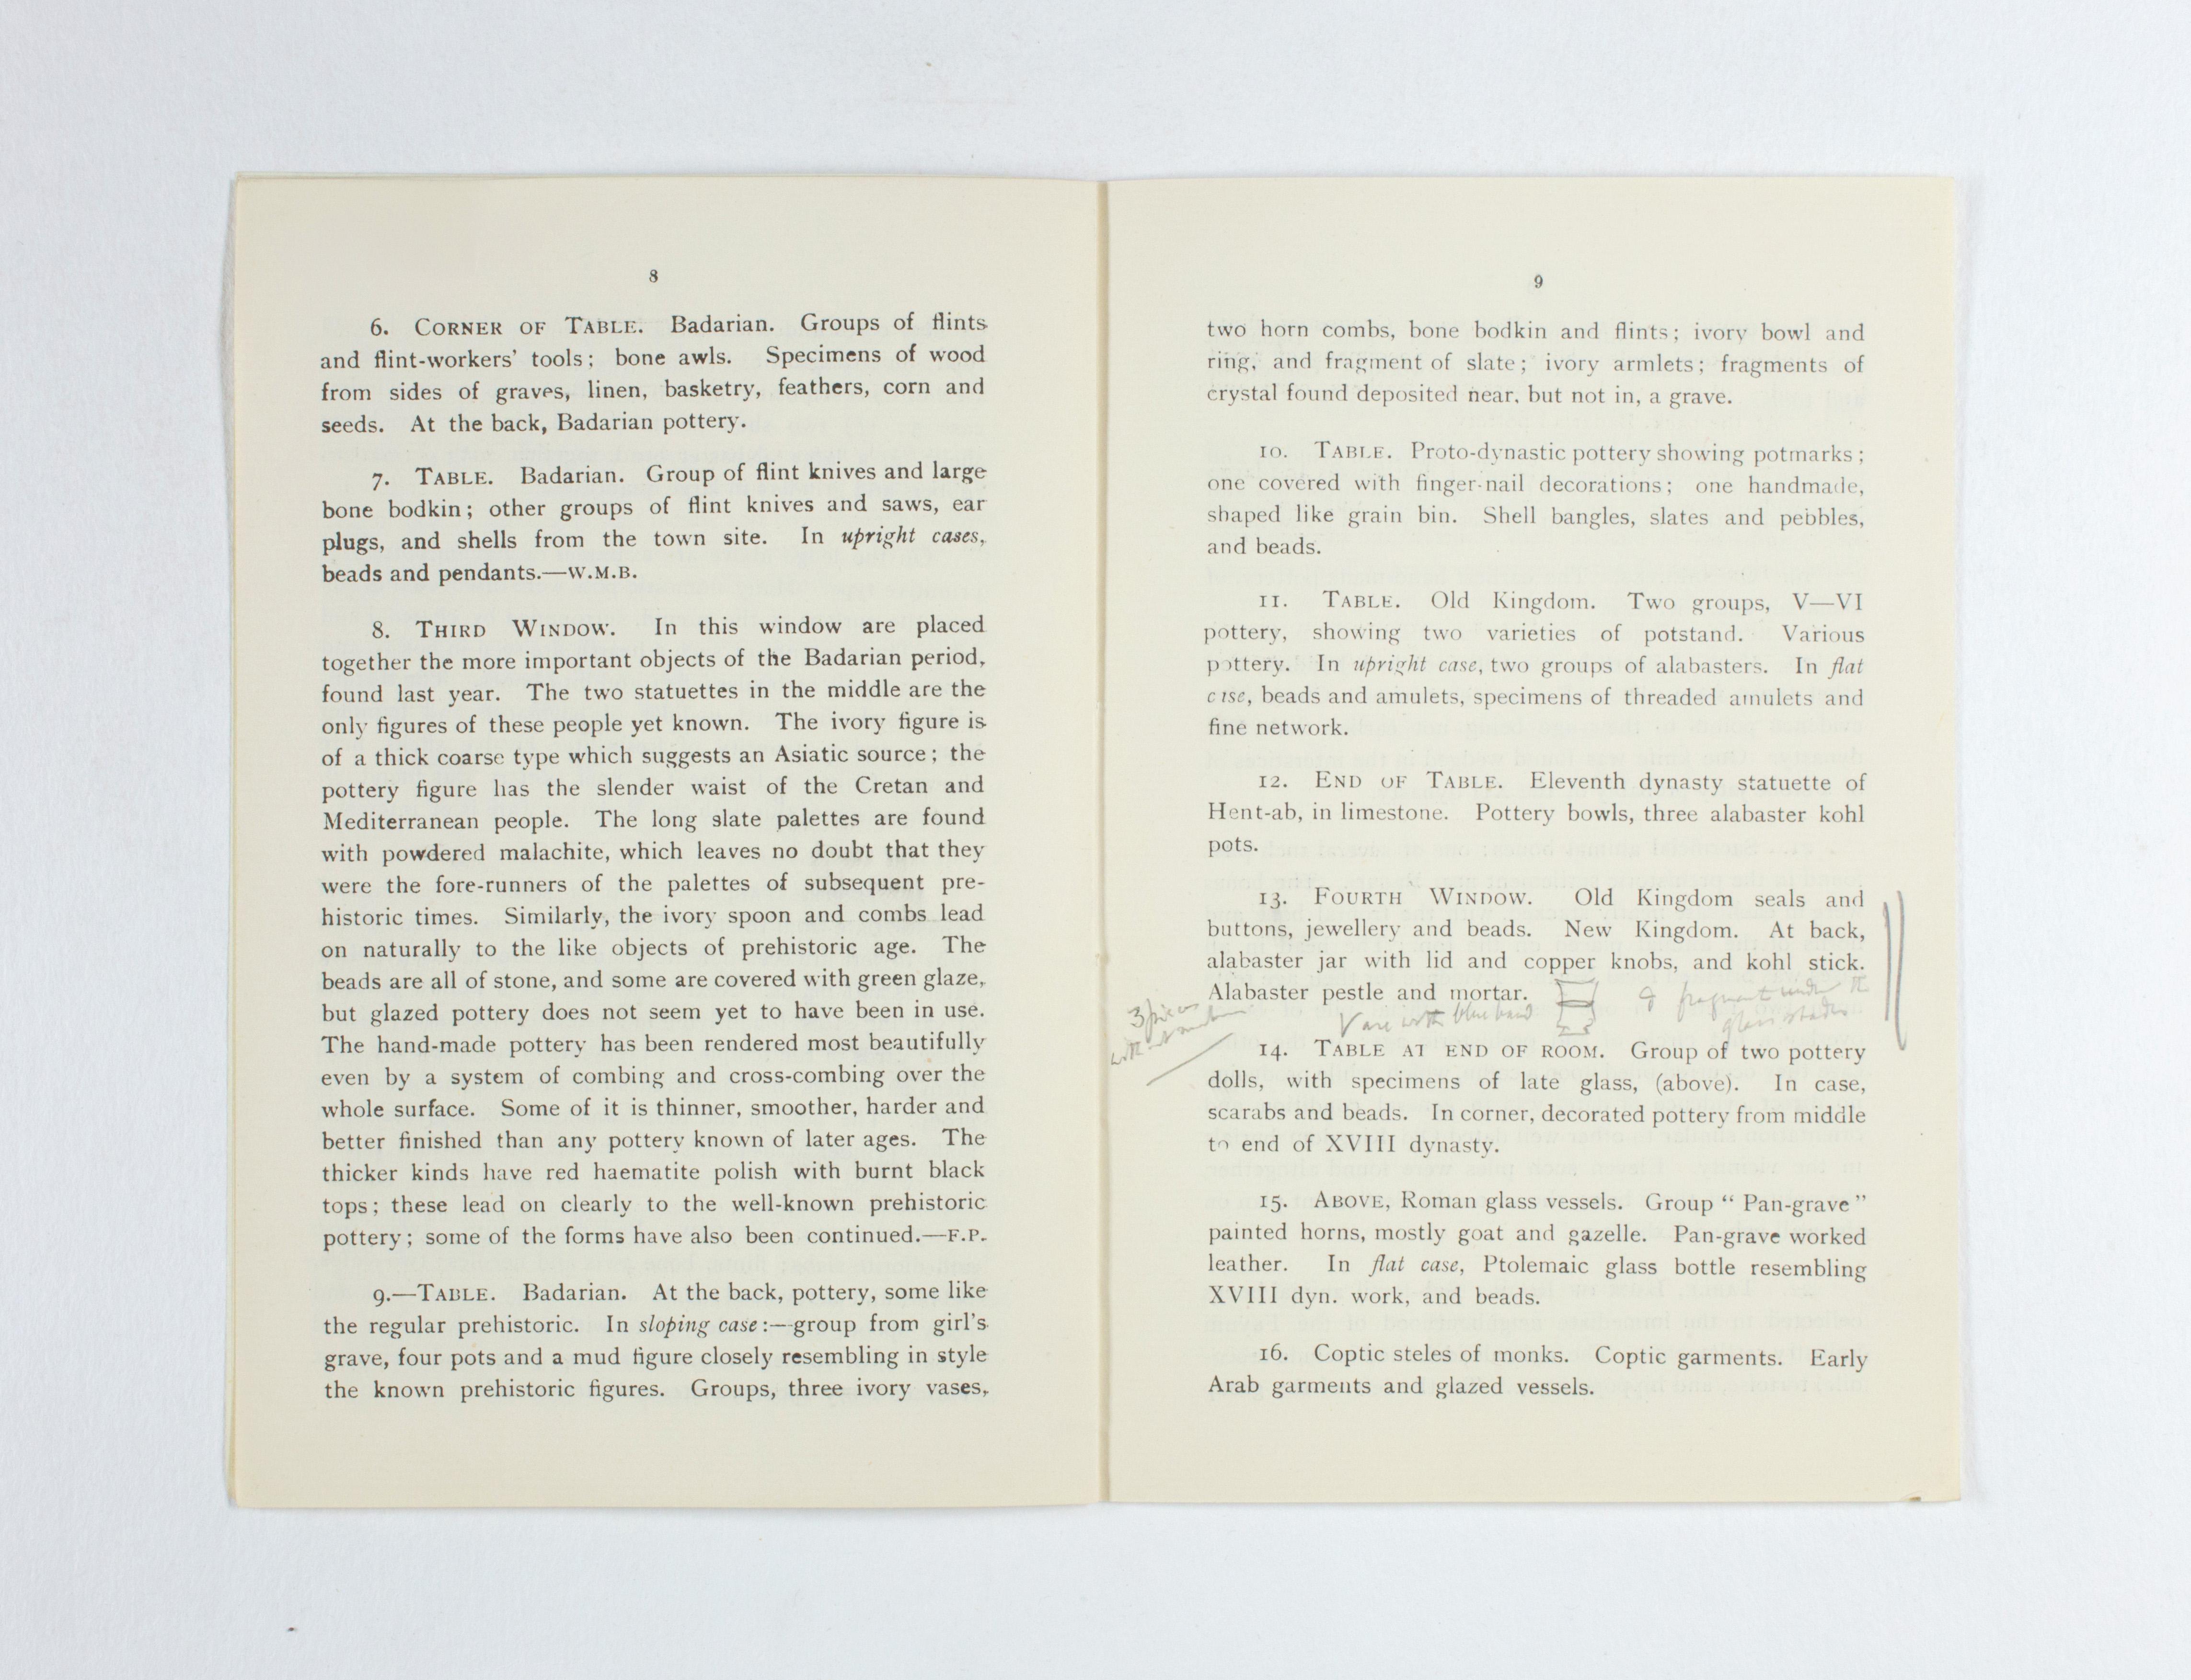 1924-25 Badari, Faiyum Exhibition catalogue PMA/WFP1/D/28/30.7